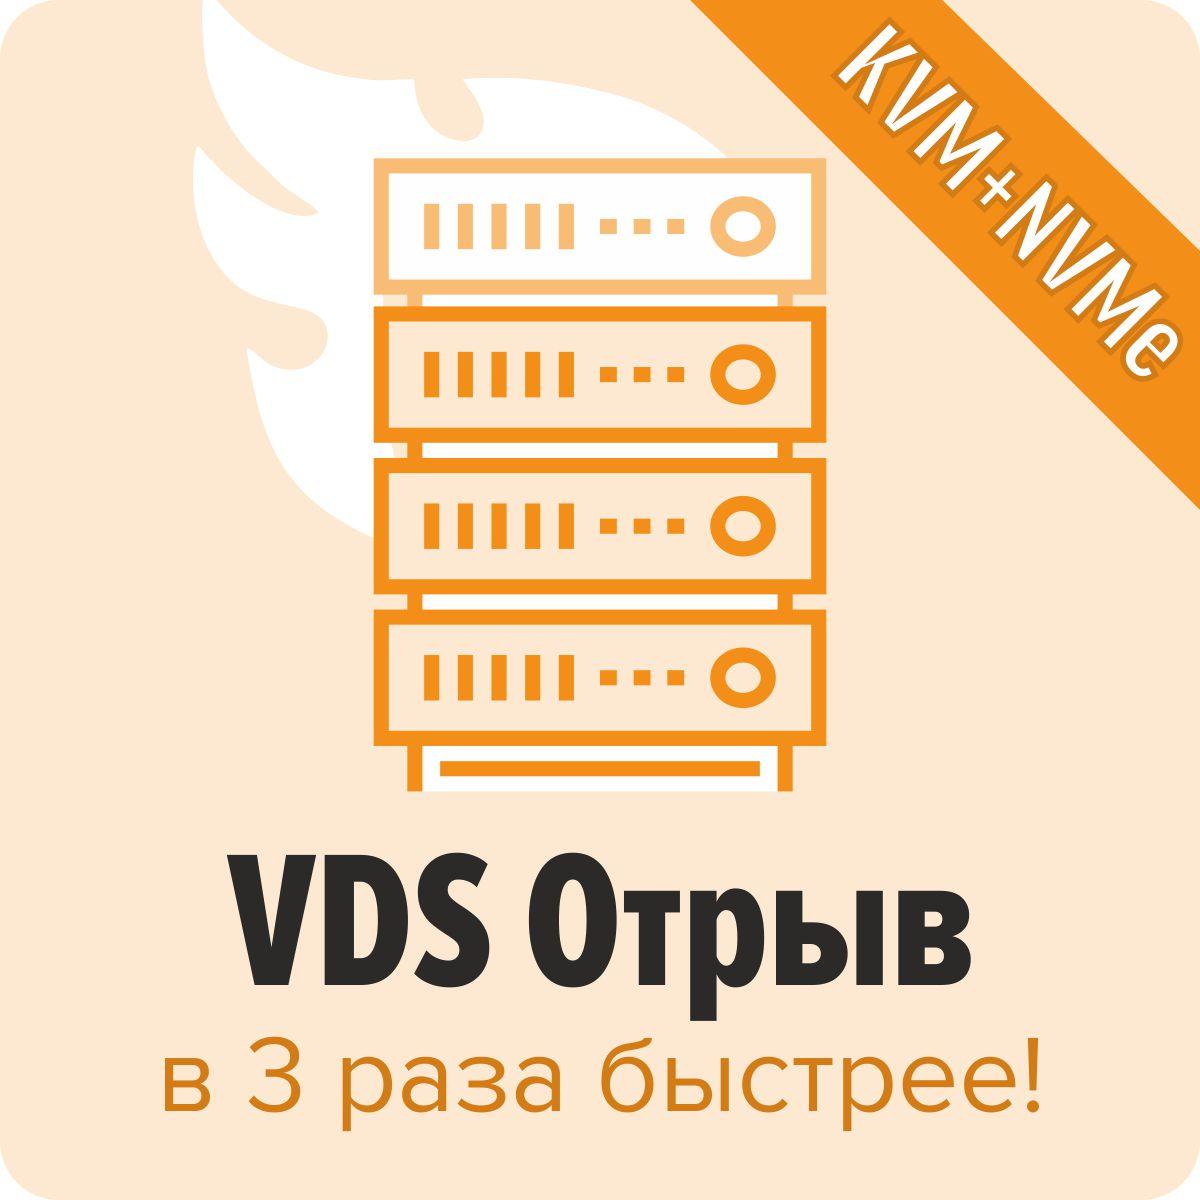 VDS Отрыв (KVM, NVMe, 4 Core, 4Gb RAM, 60Gb NVMe)